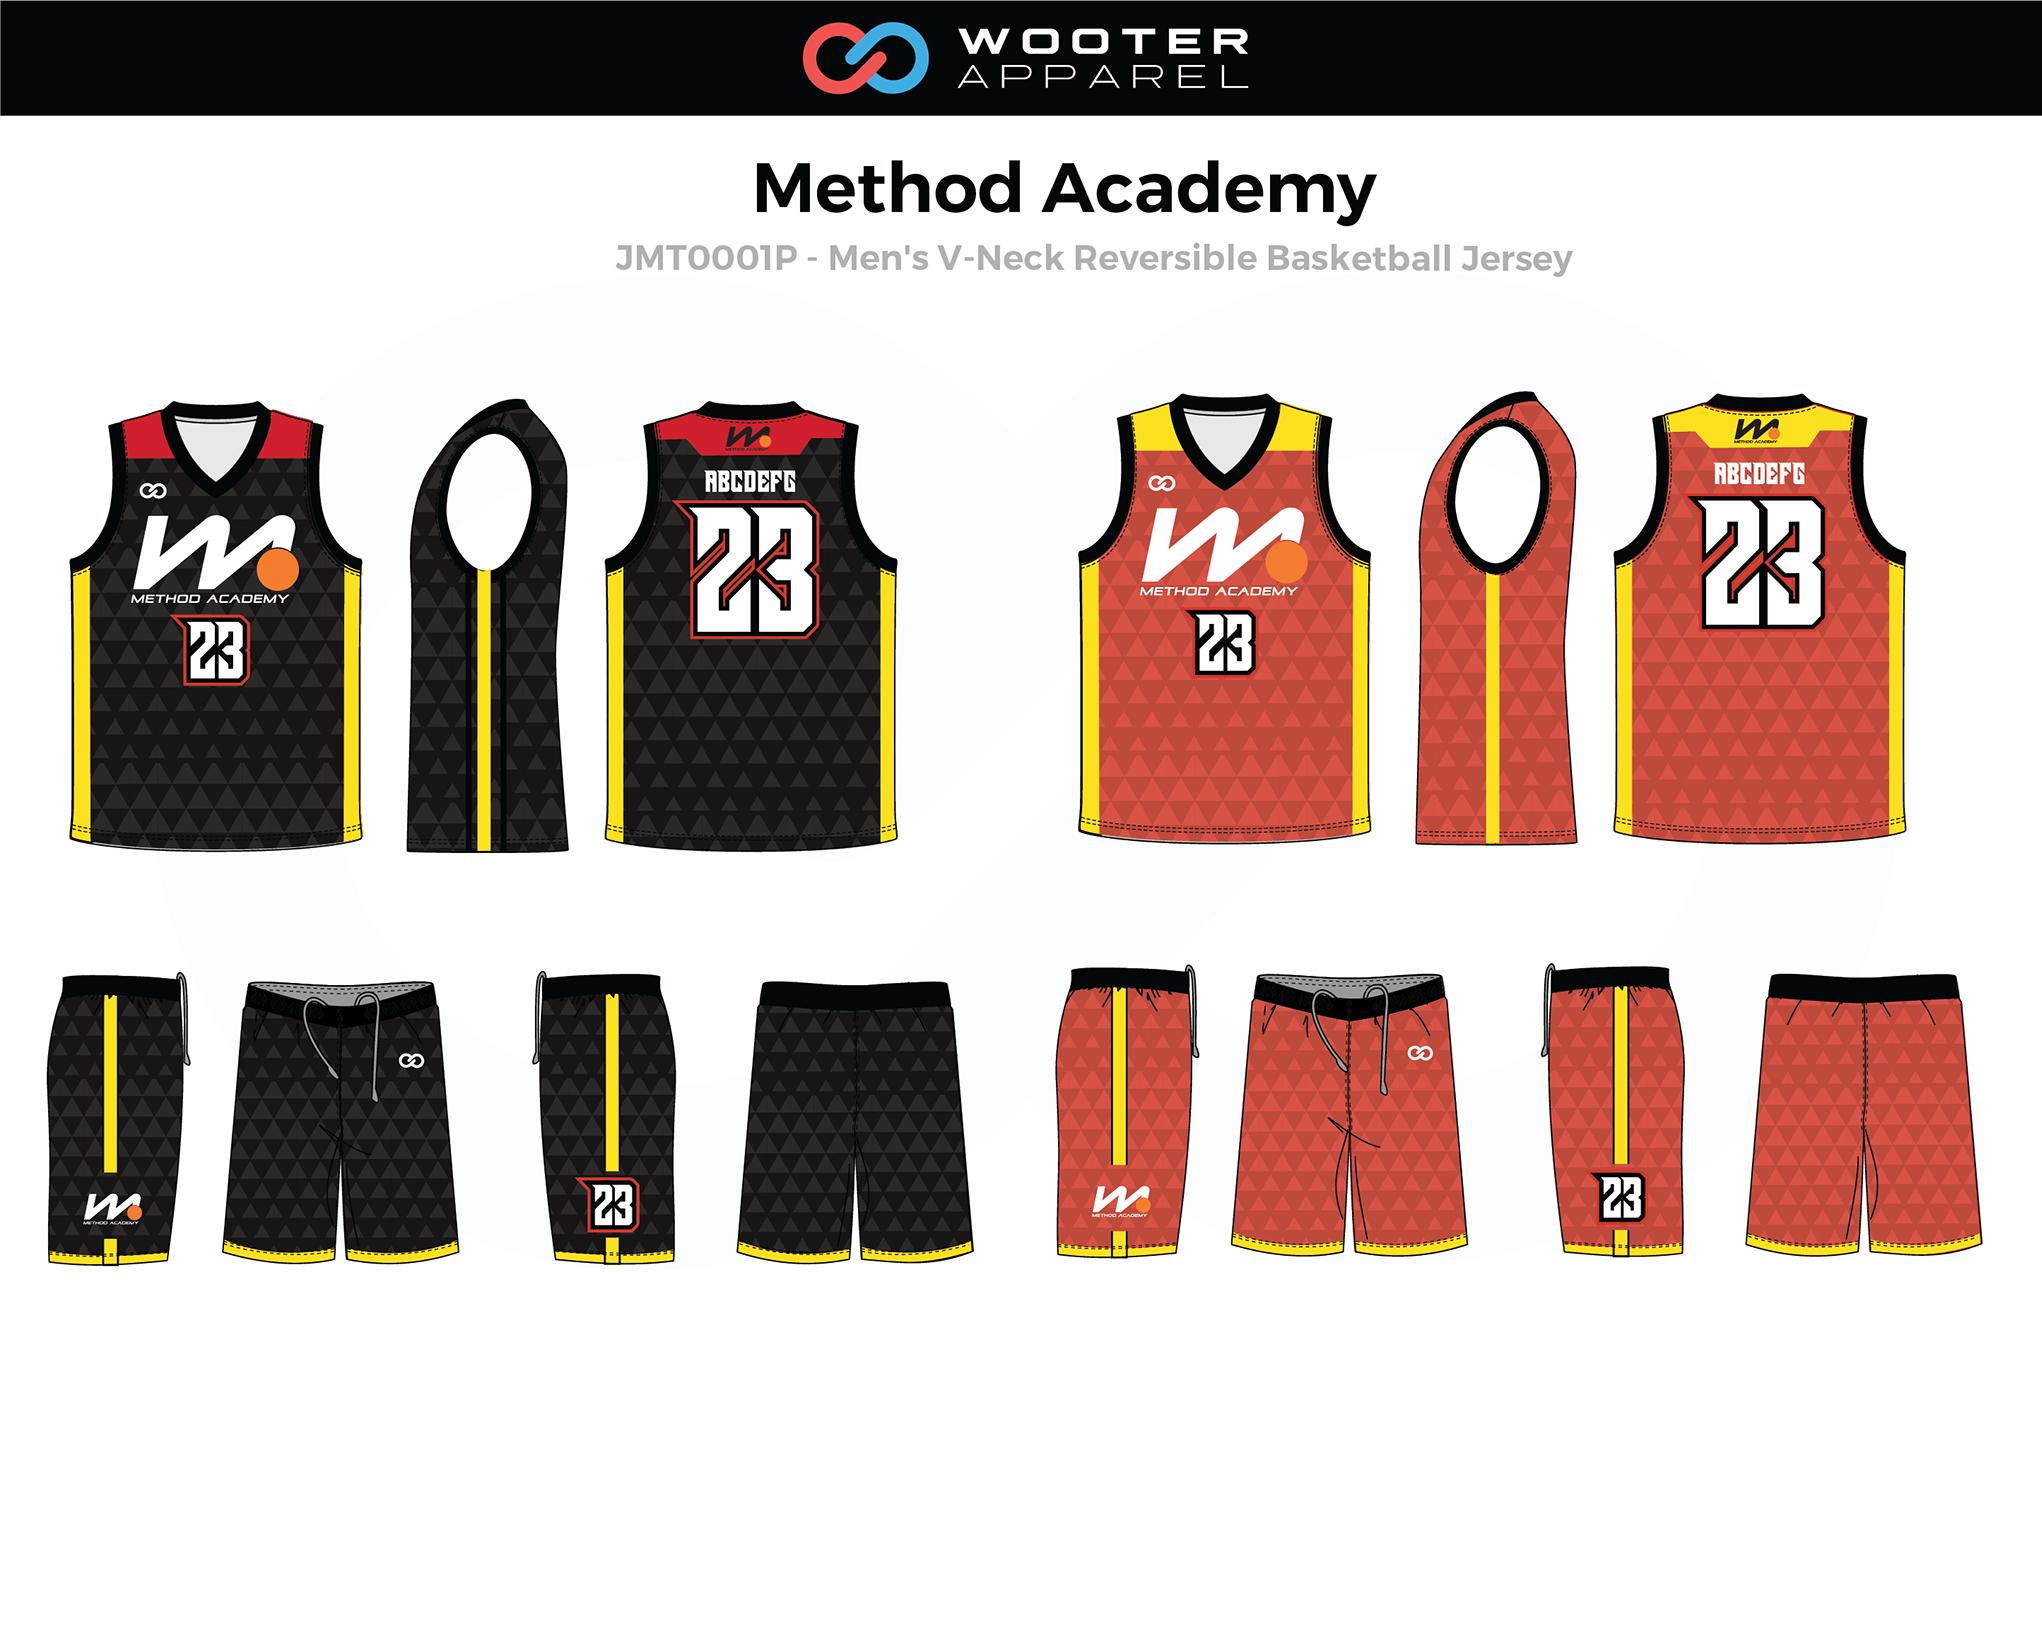 Method academy basketball - Men's V-Neck Basketball Jersey-02.png